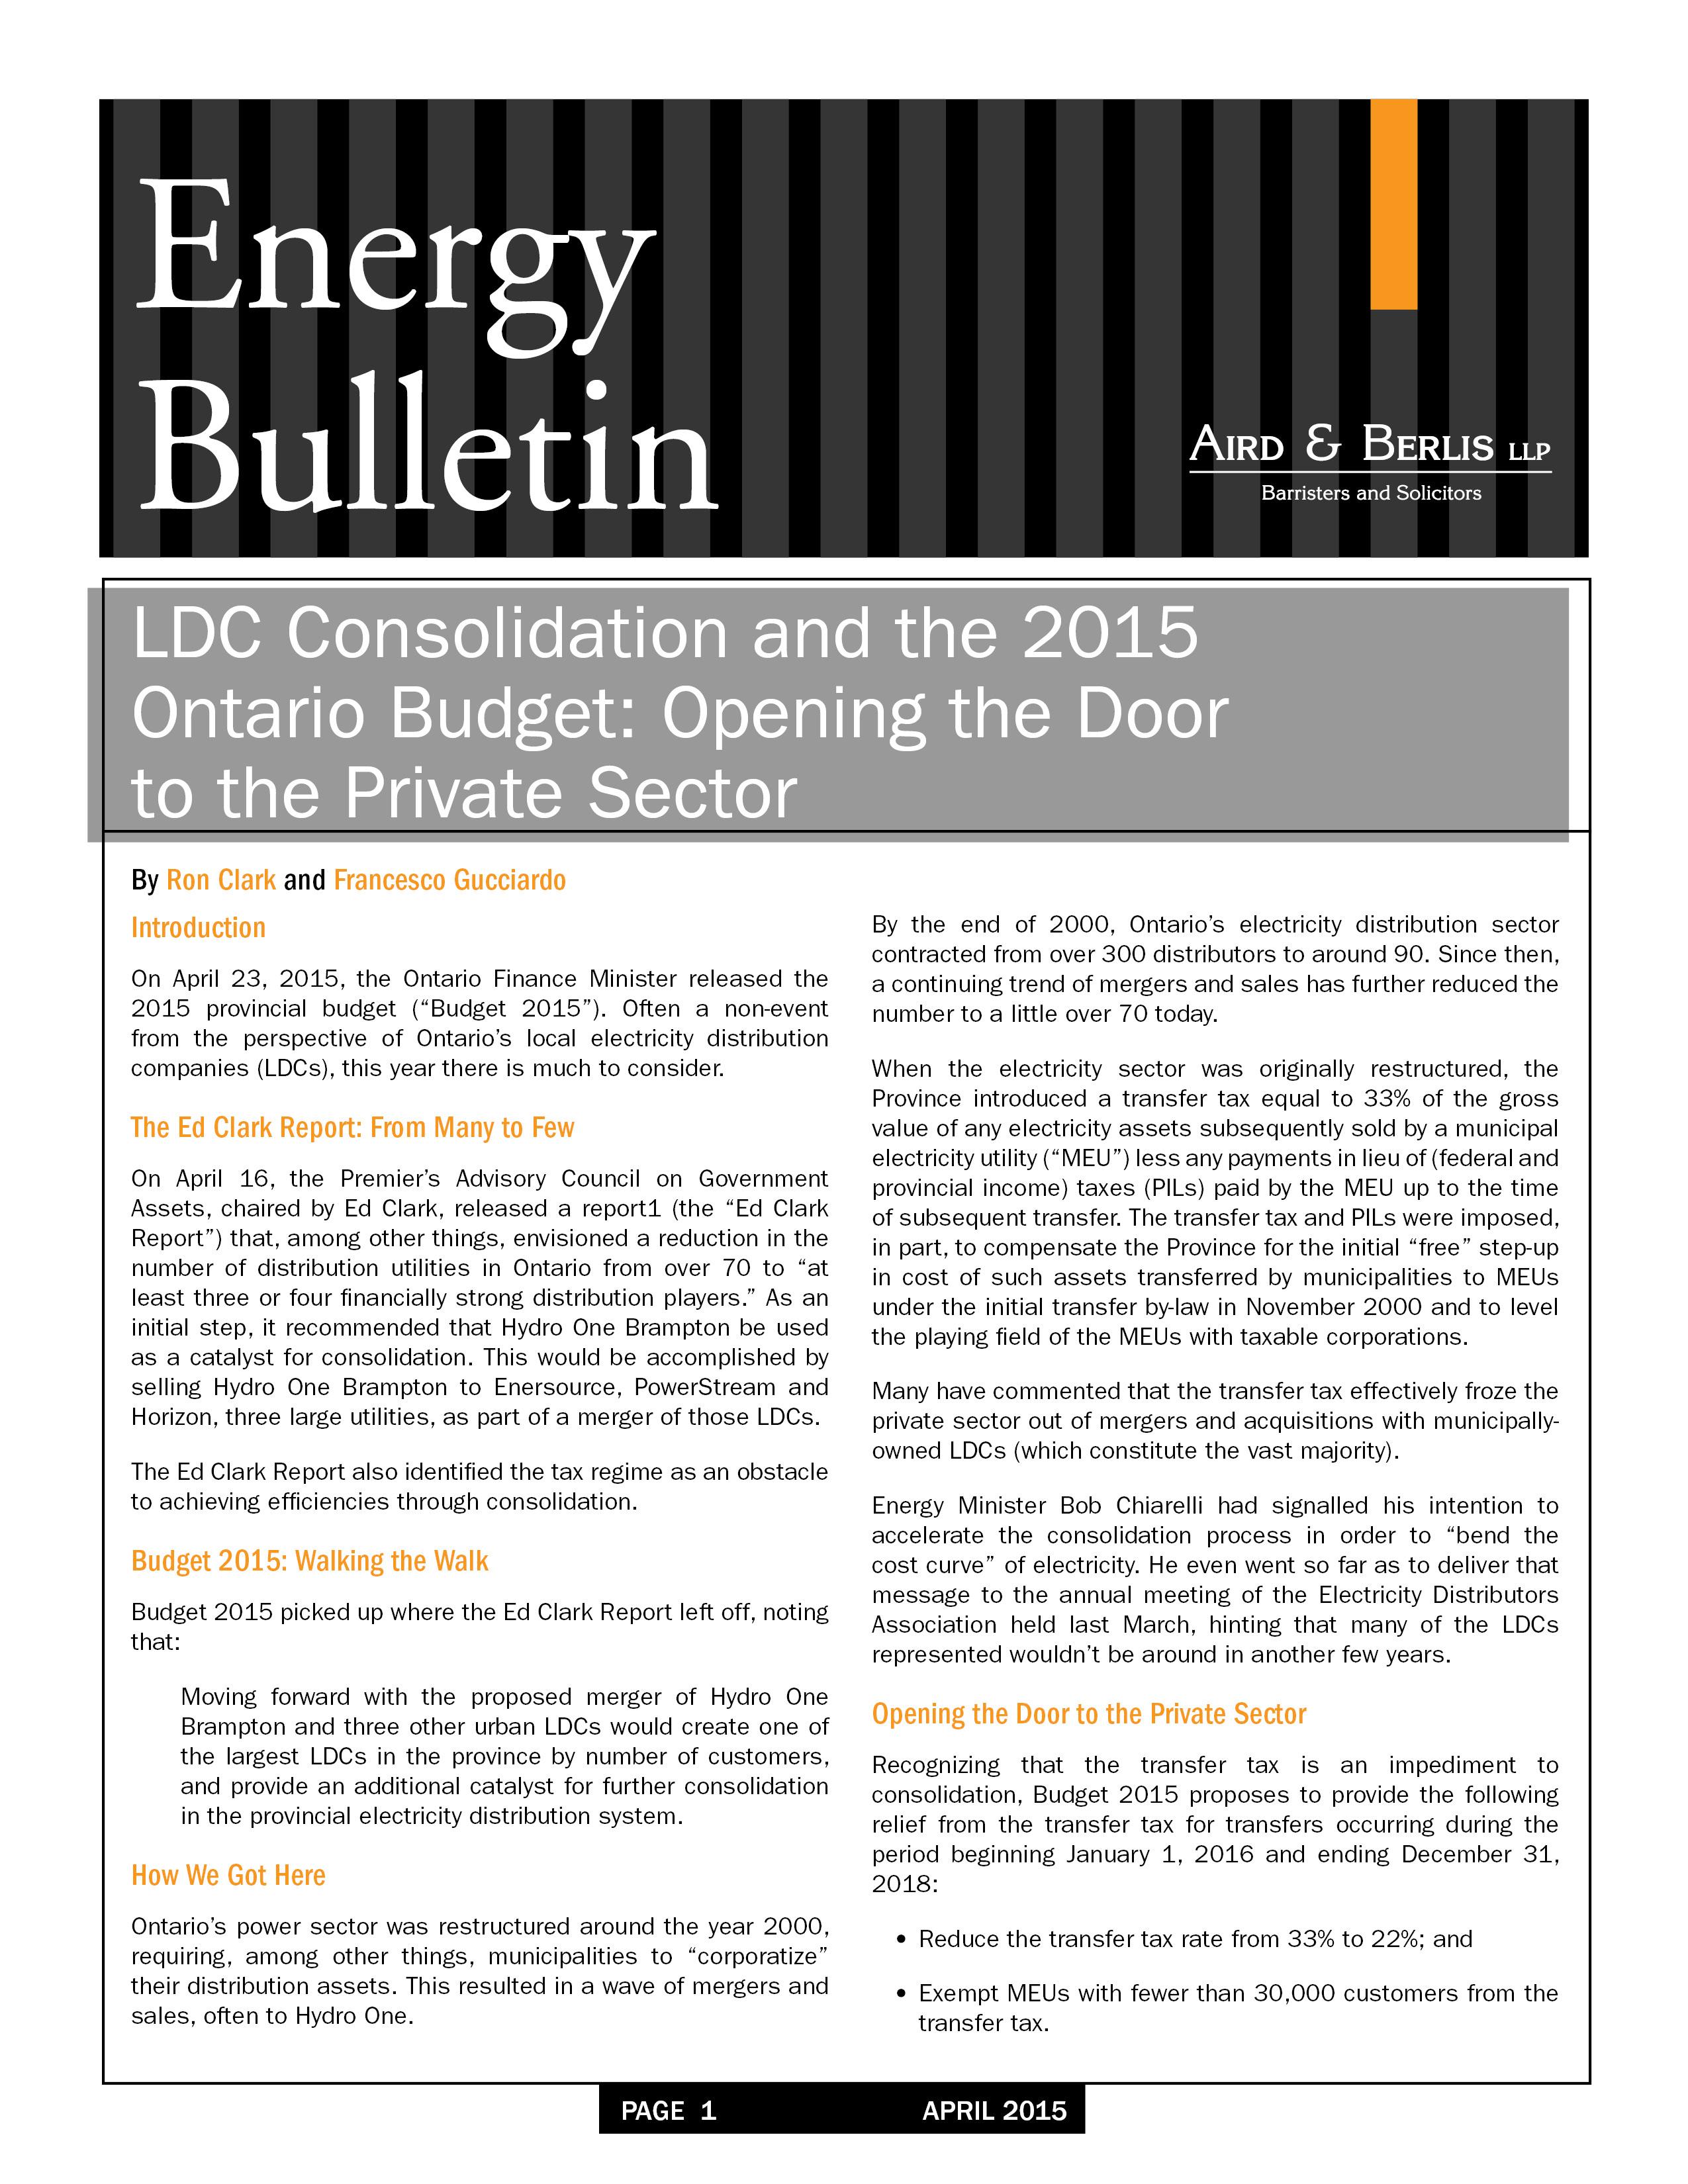 Energy-Bulletin-April-2015